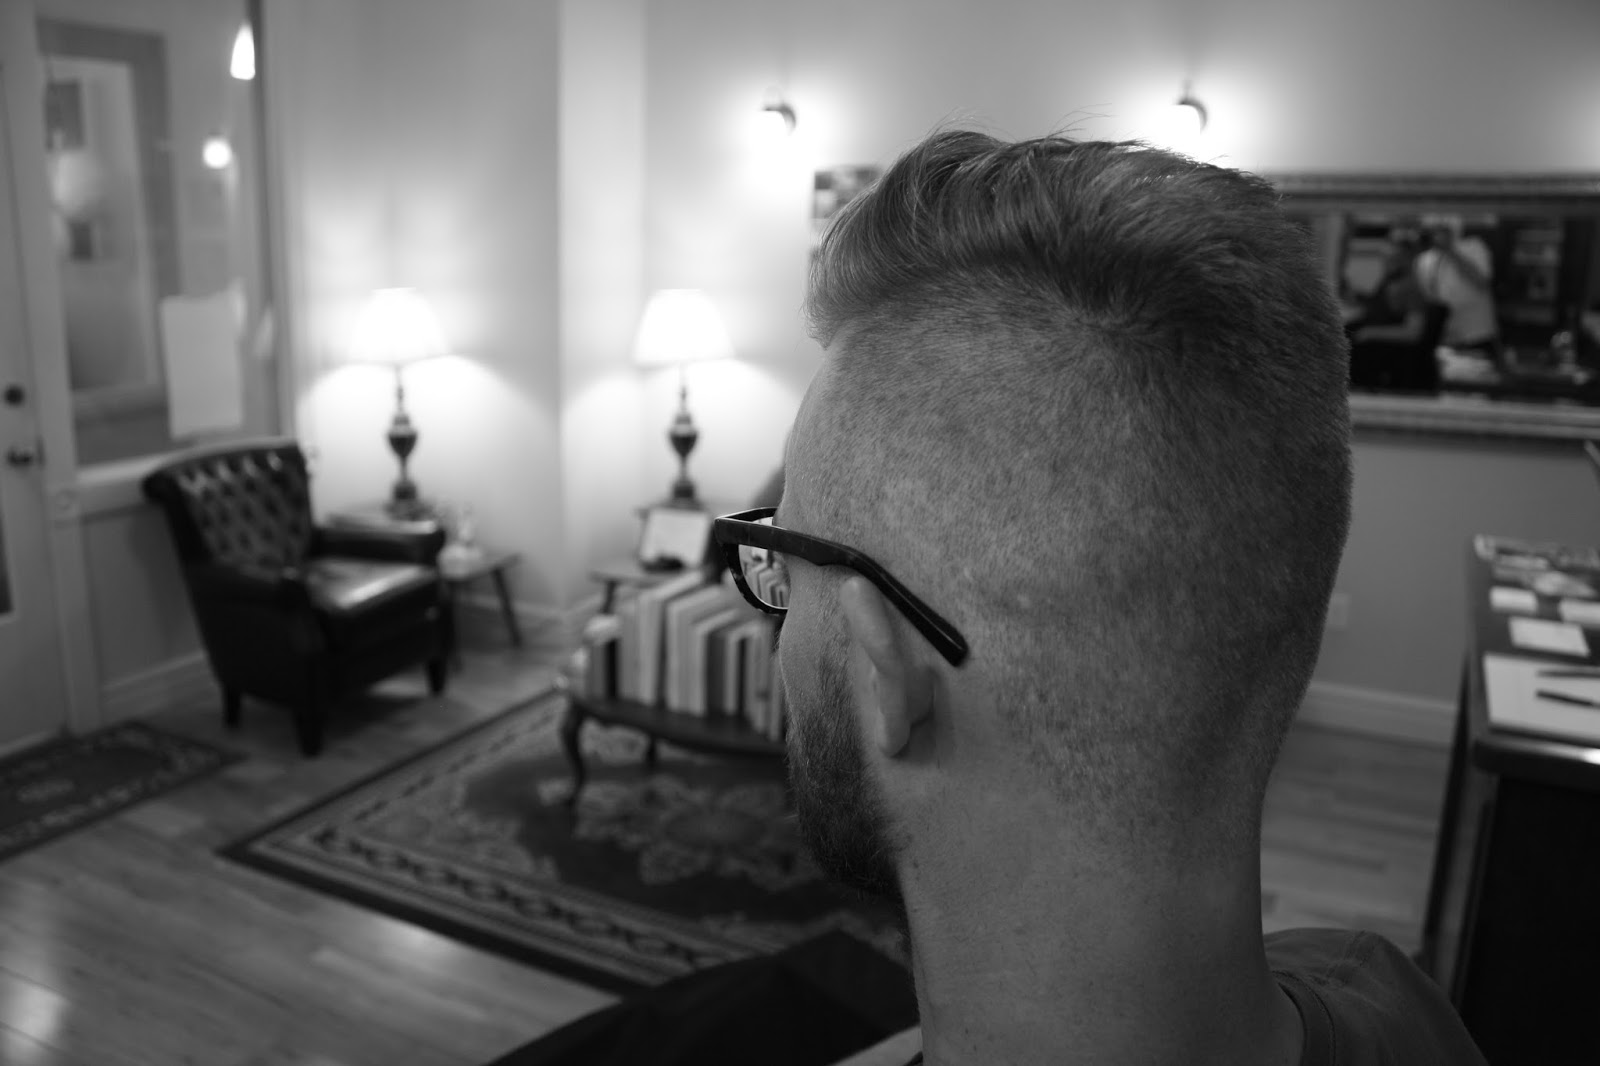 Danburry Barber Shop: March 2014